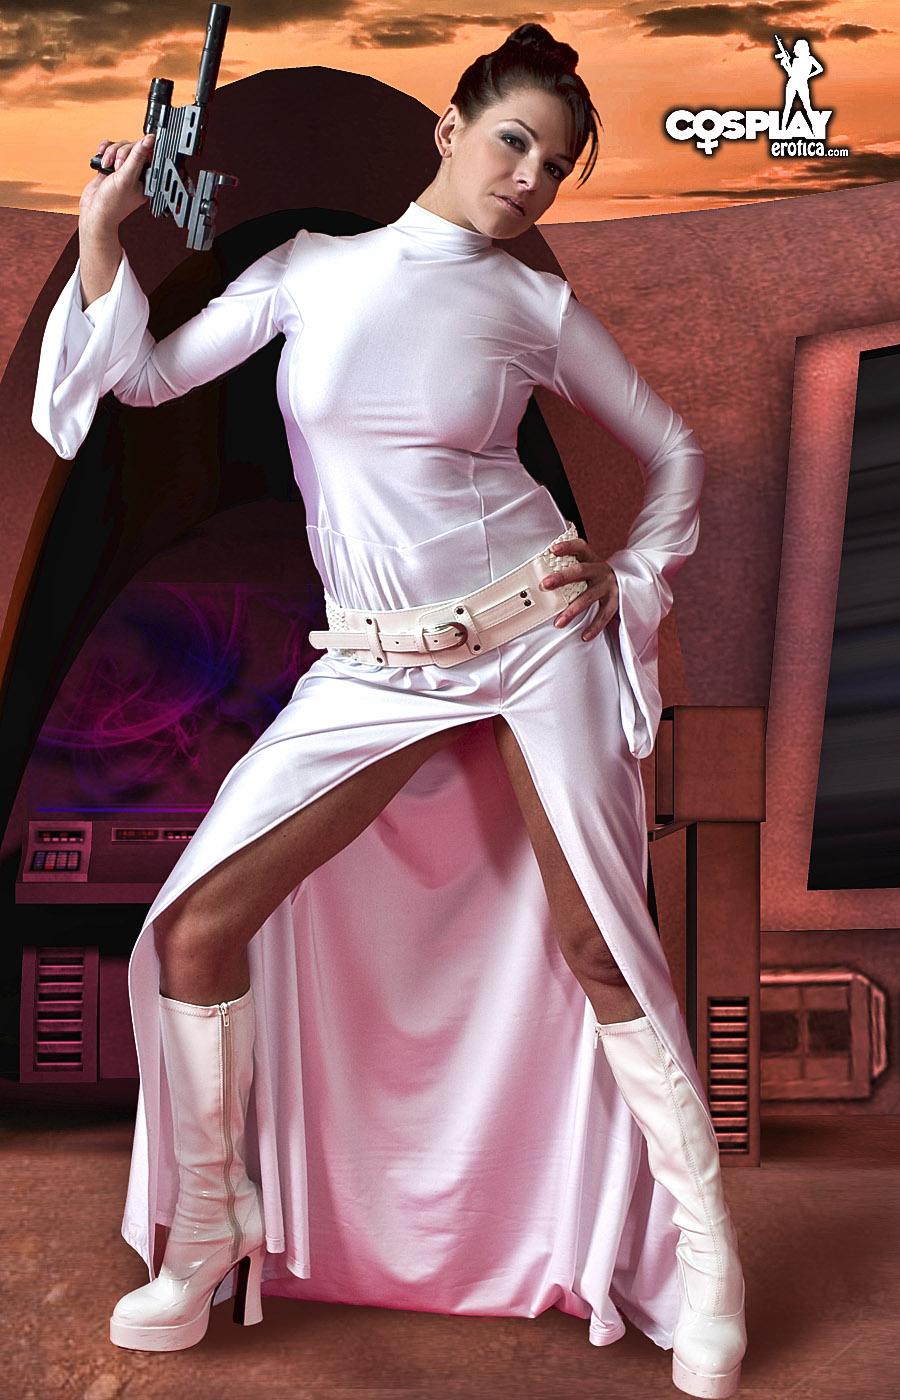 Princess leia cosplay porn